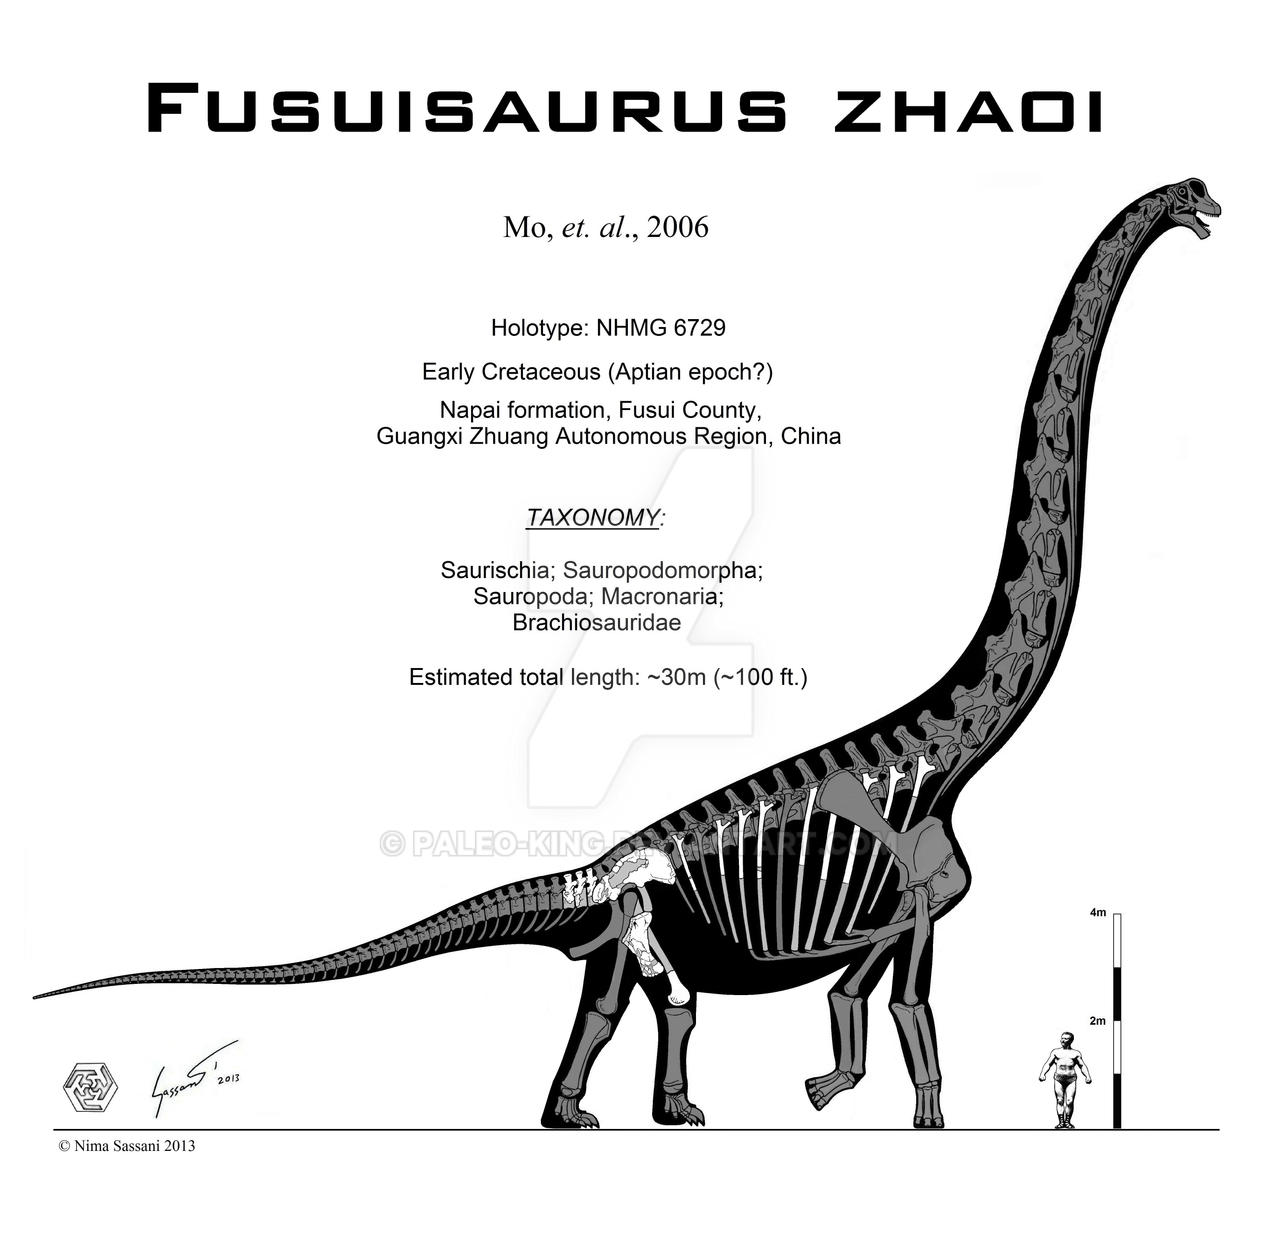 Fusuisaurus zhaoi skeletal by Paleo-King